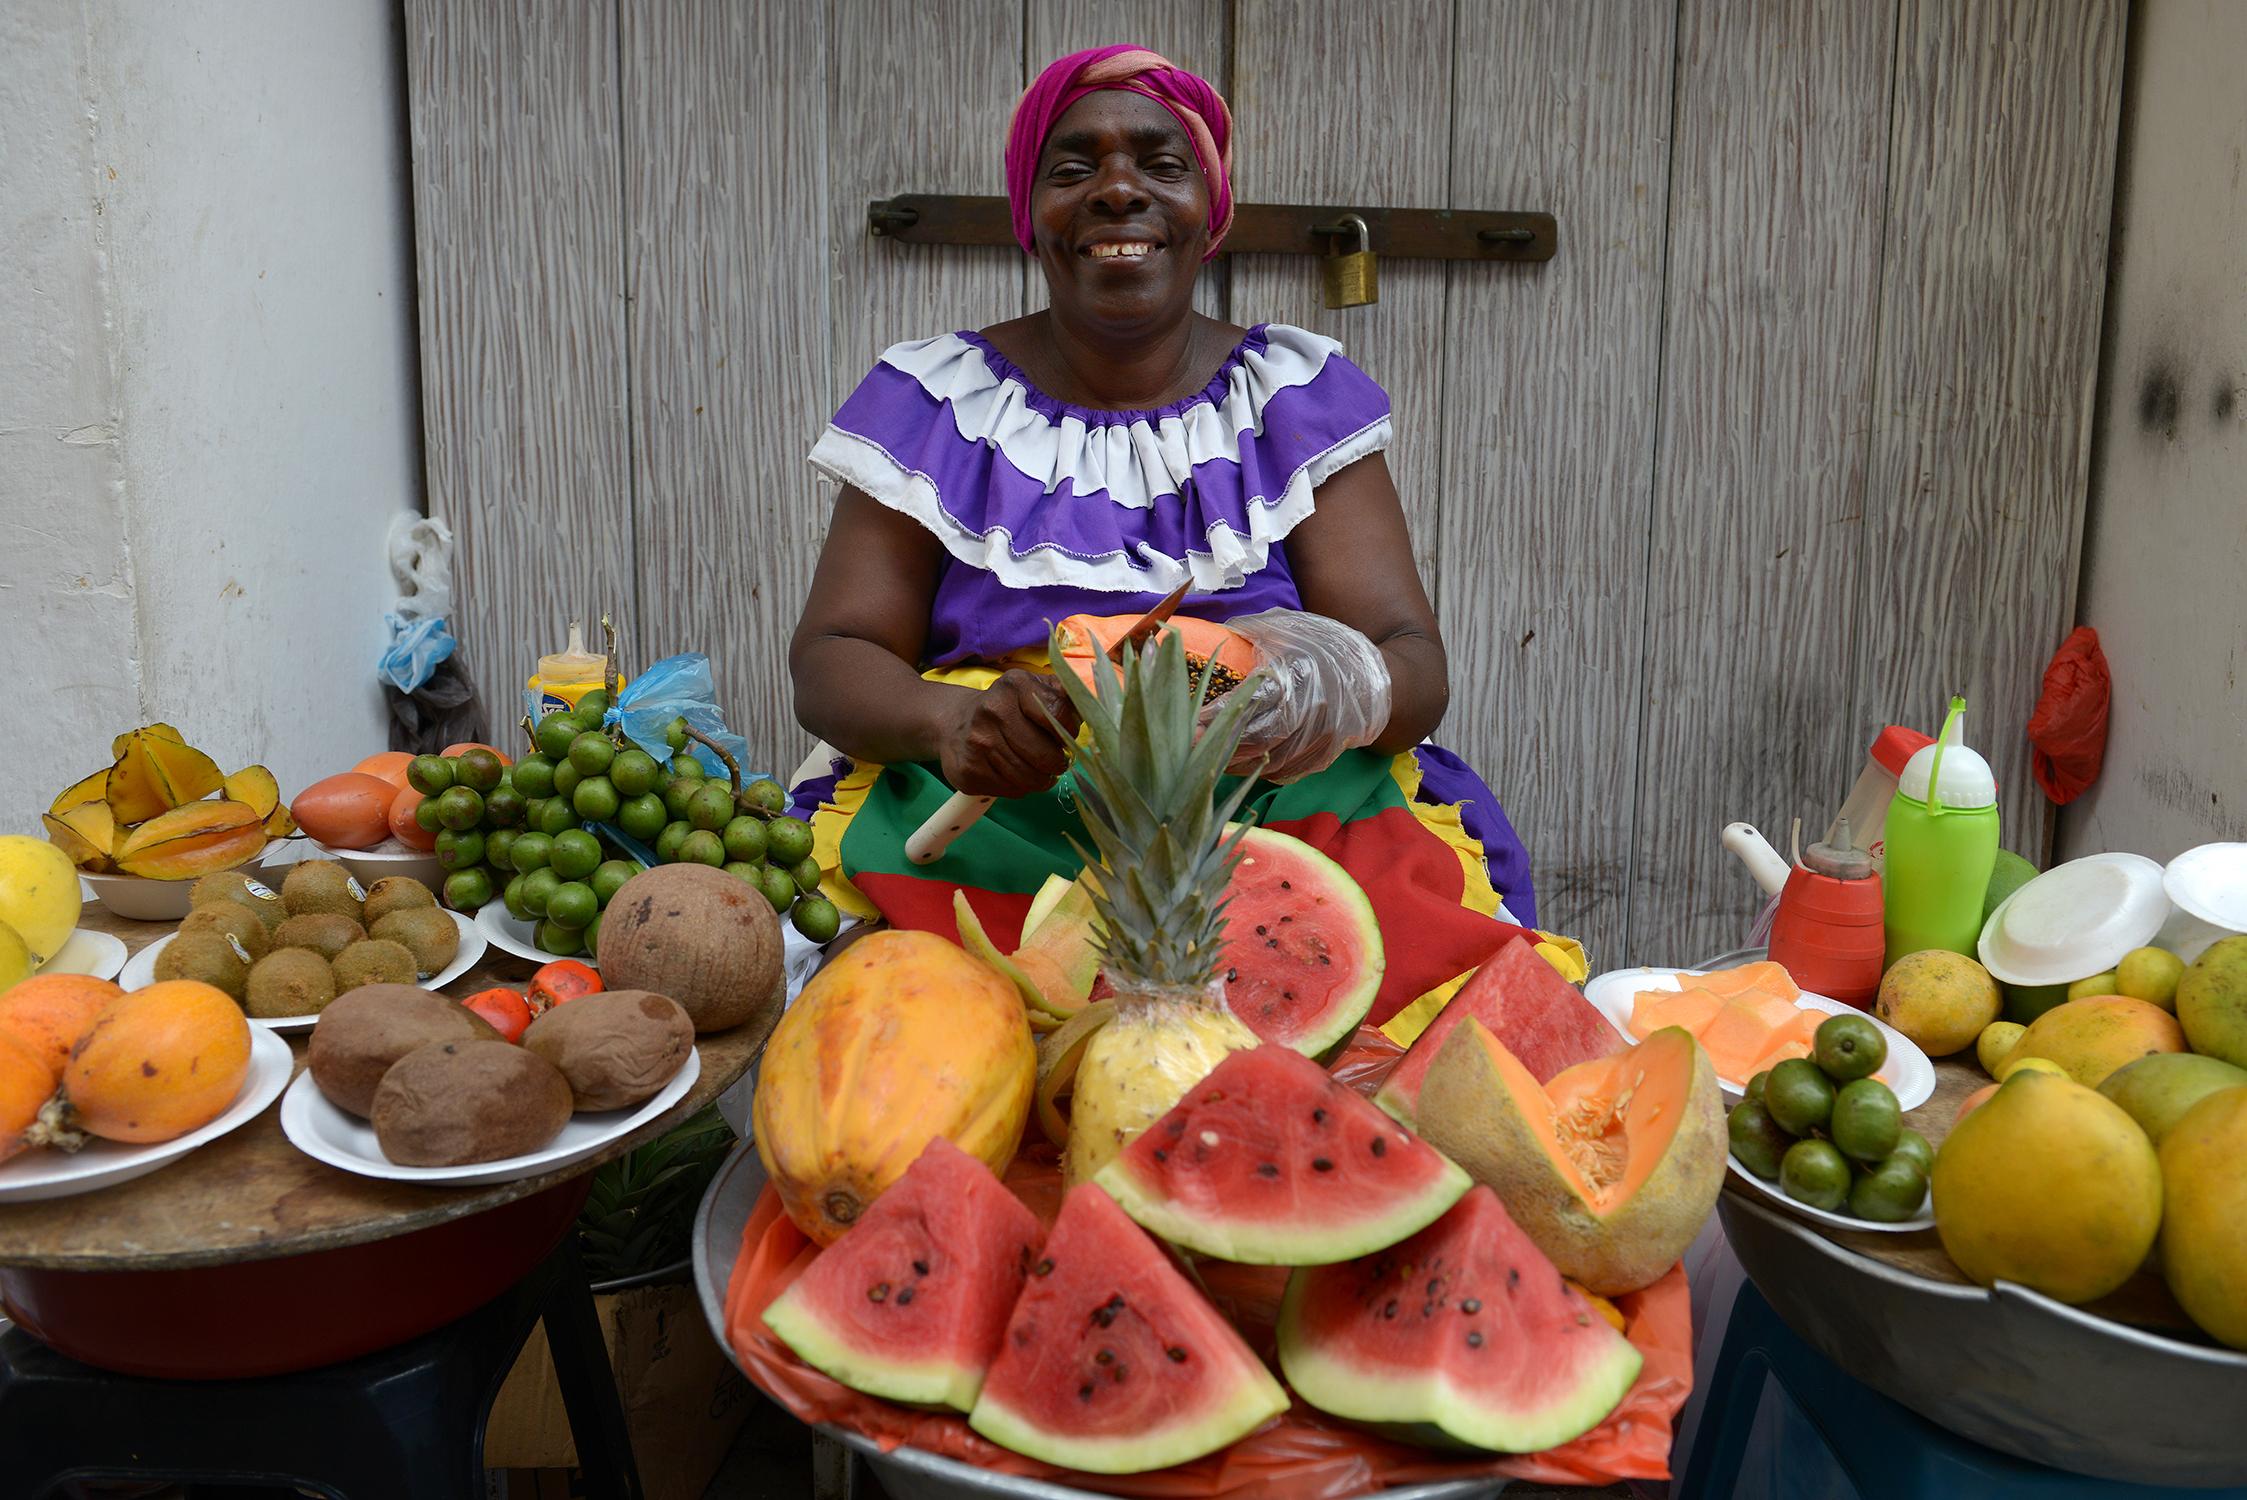 Cartagena de Indias, Cartagena, Kolumbia, hedelmät